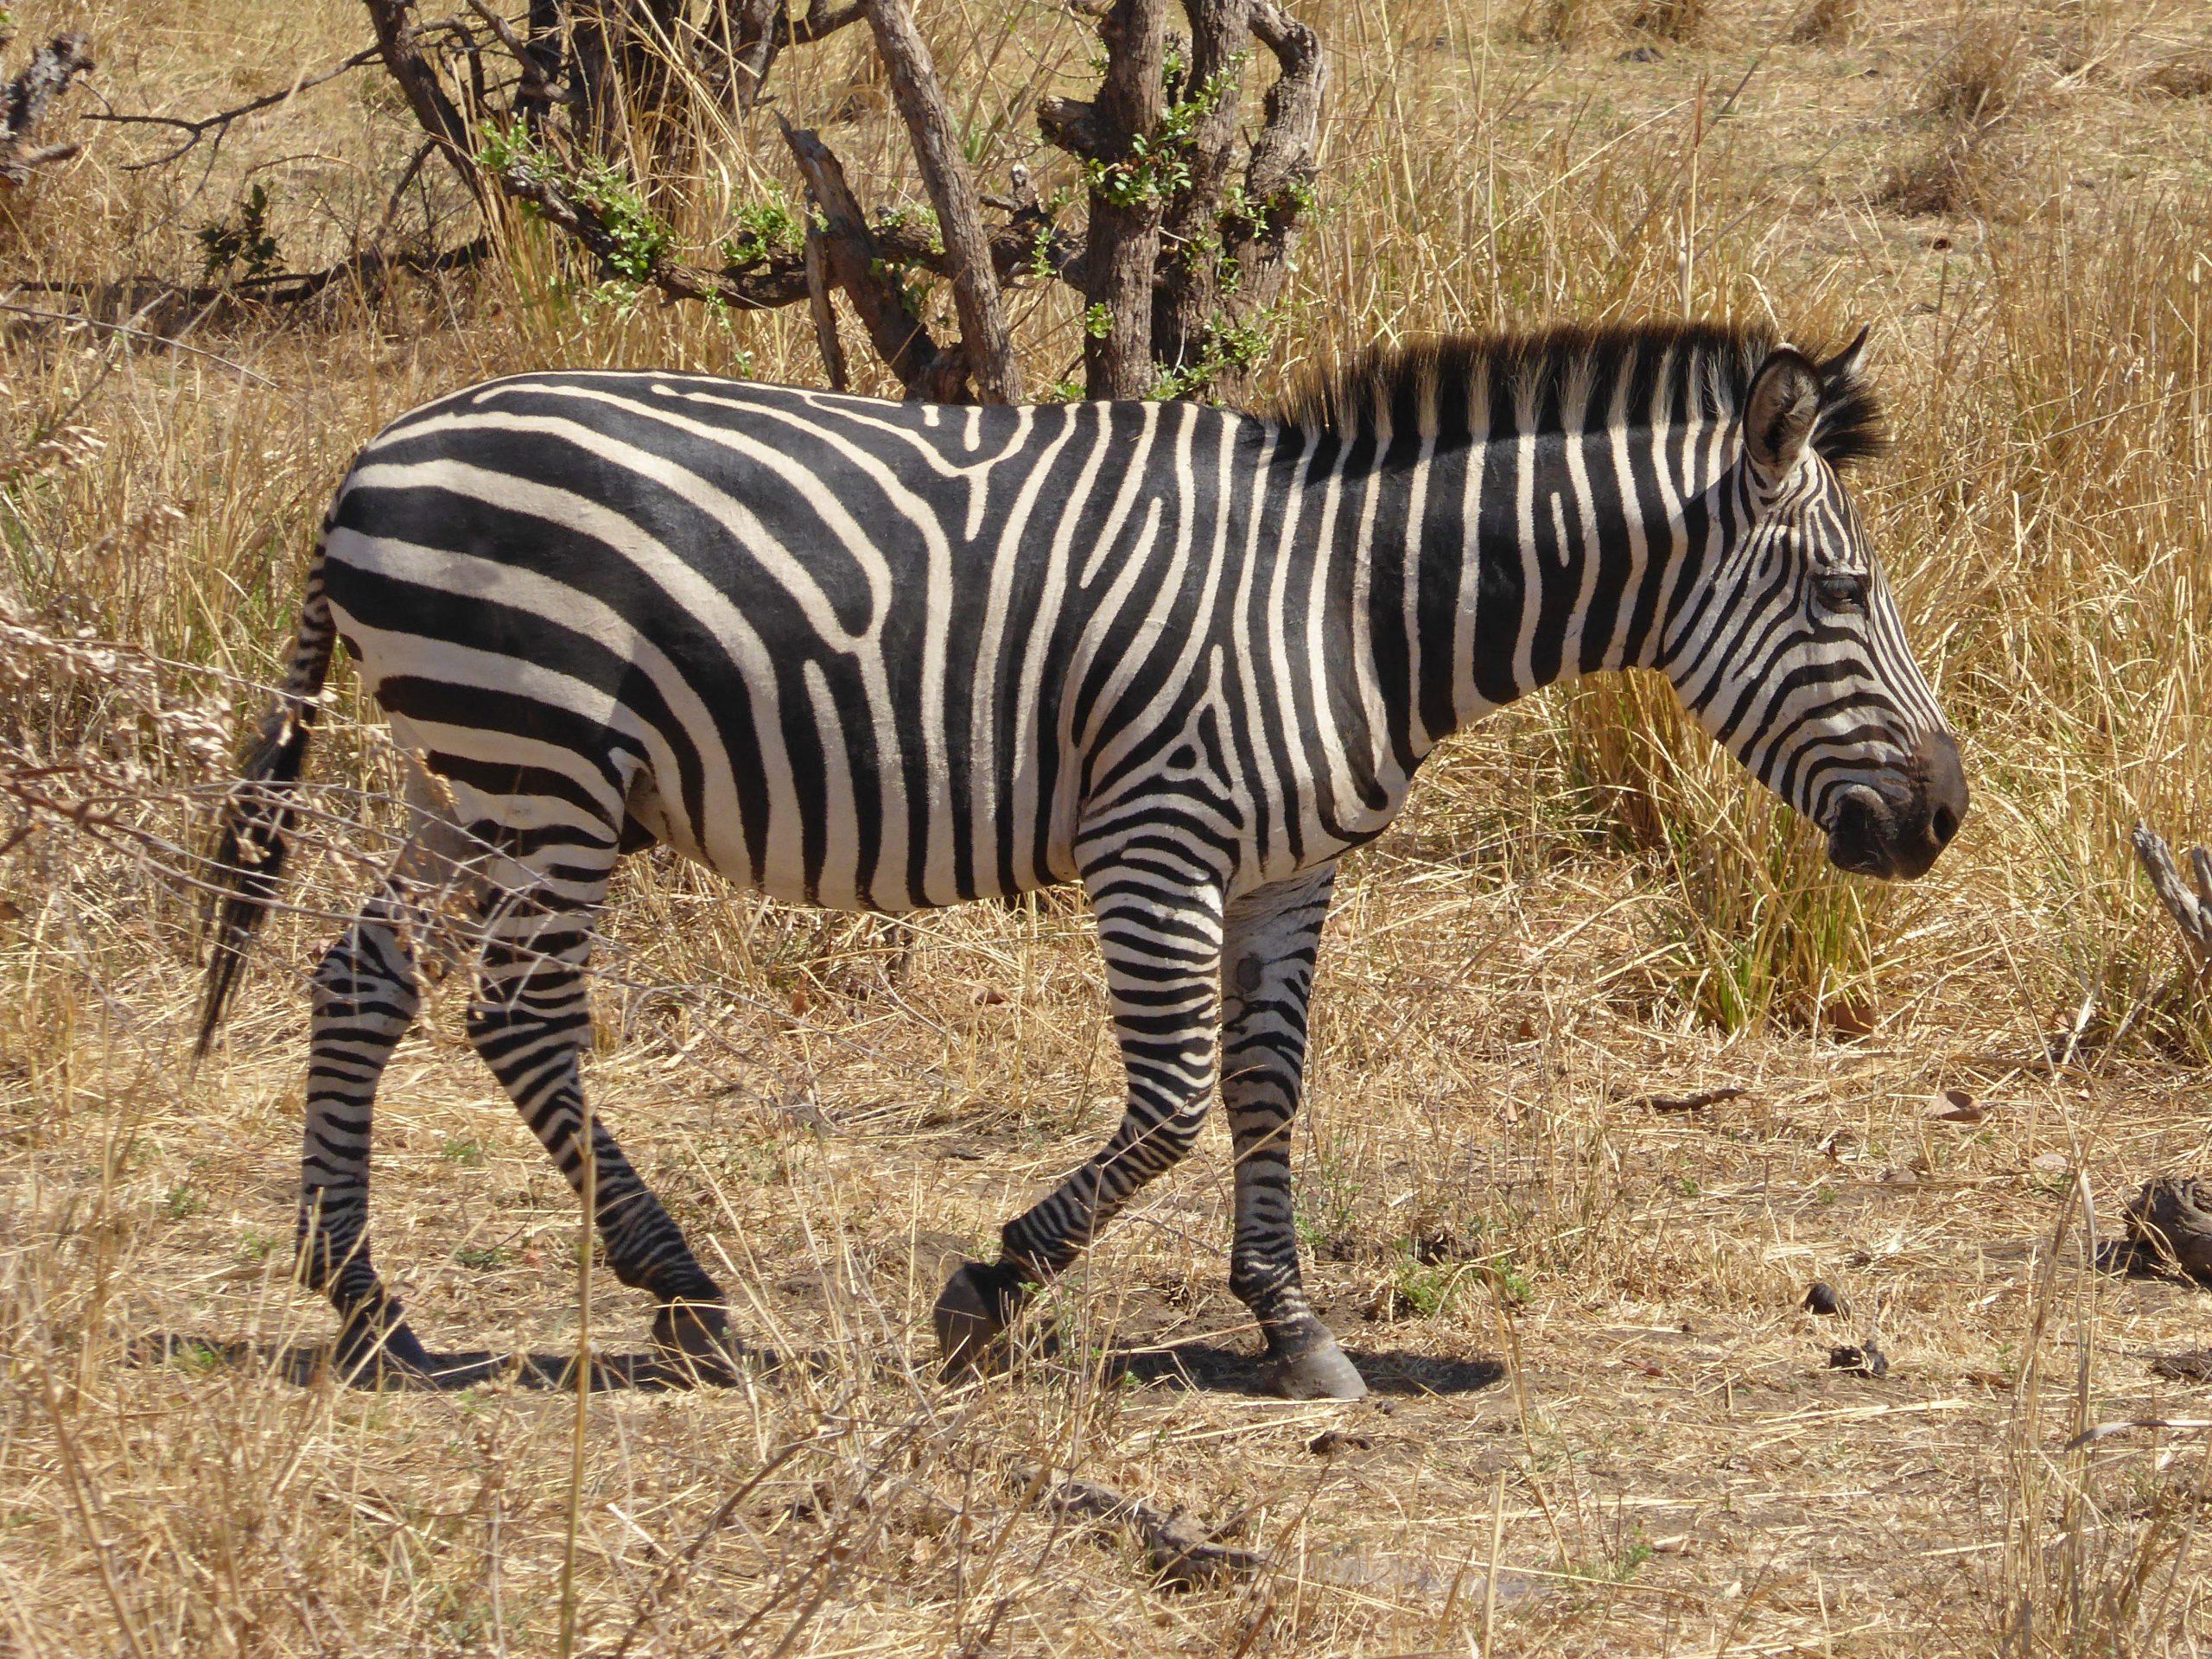 Radreise Afrika 2014 - Mosi-oa-Tunya - Zebra